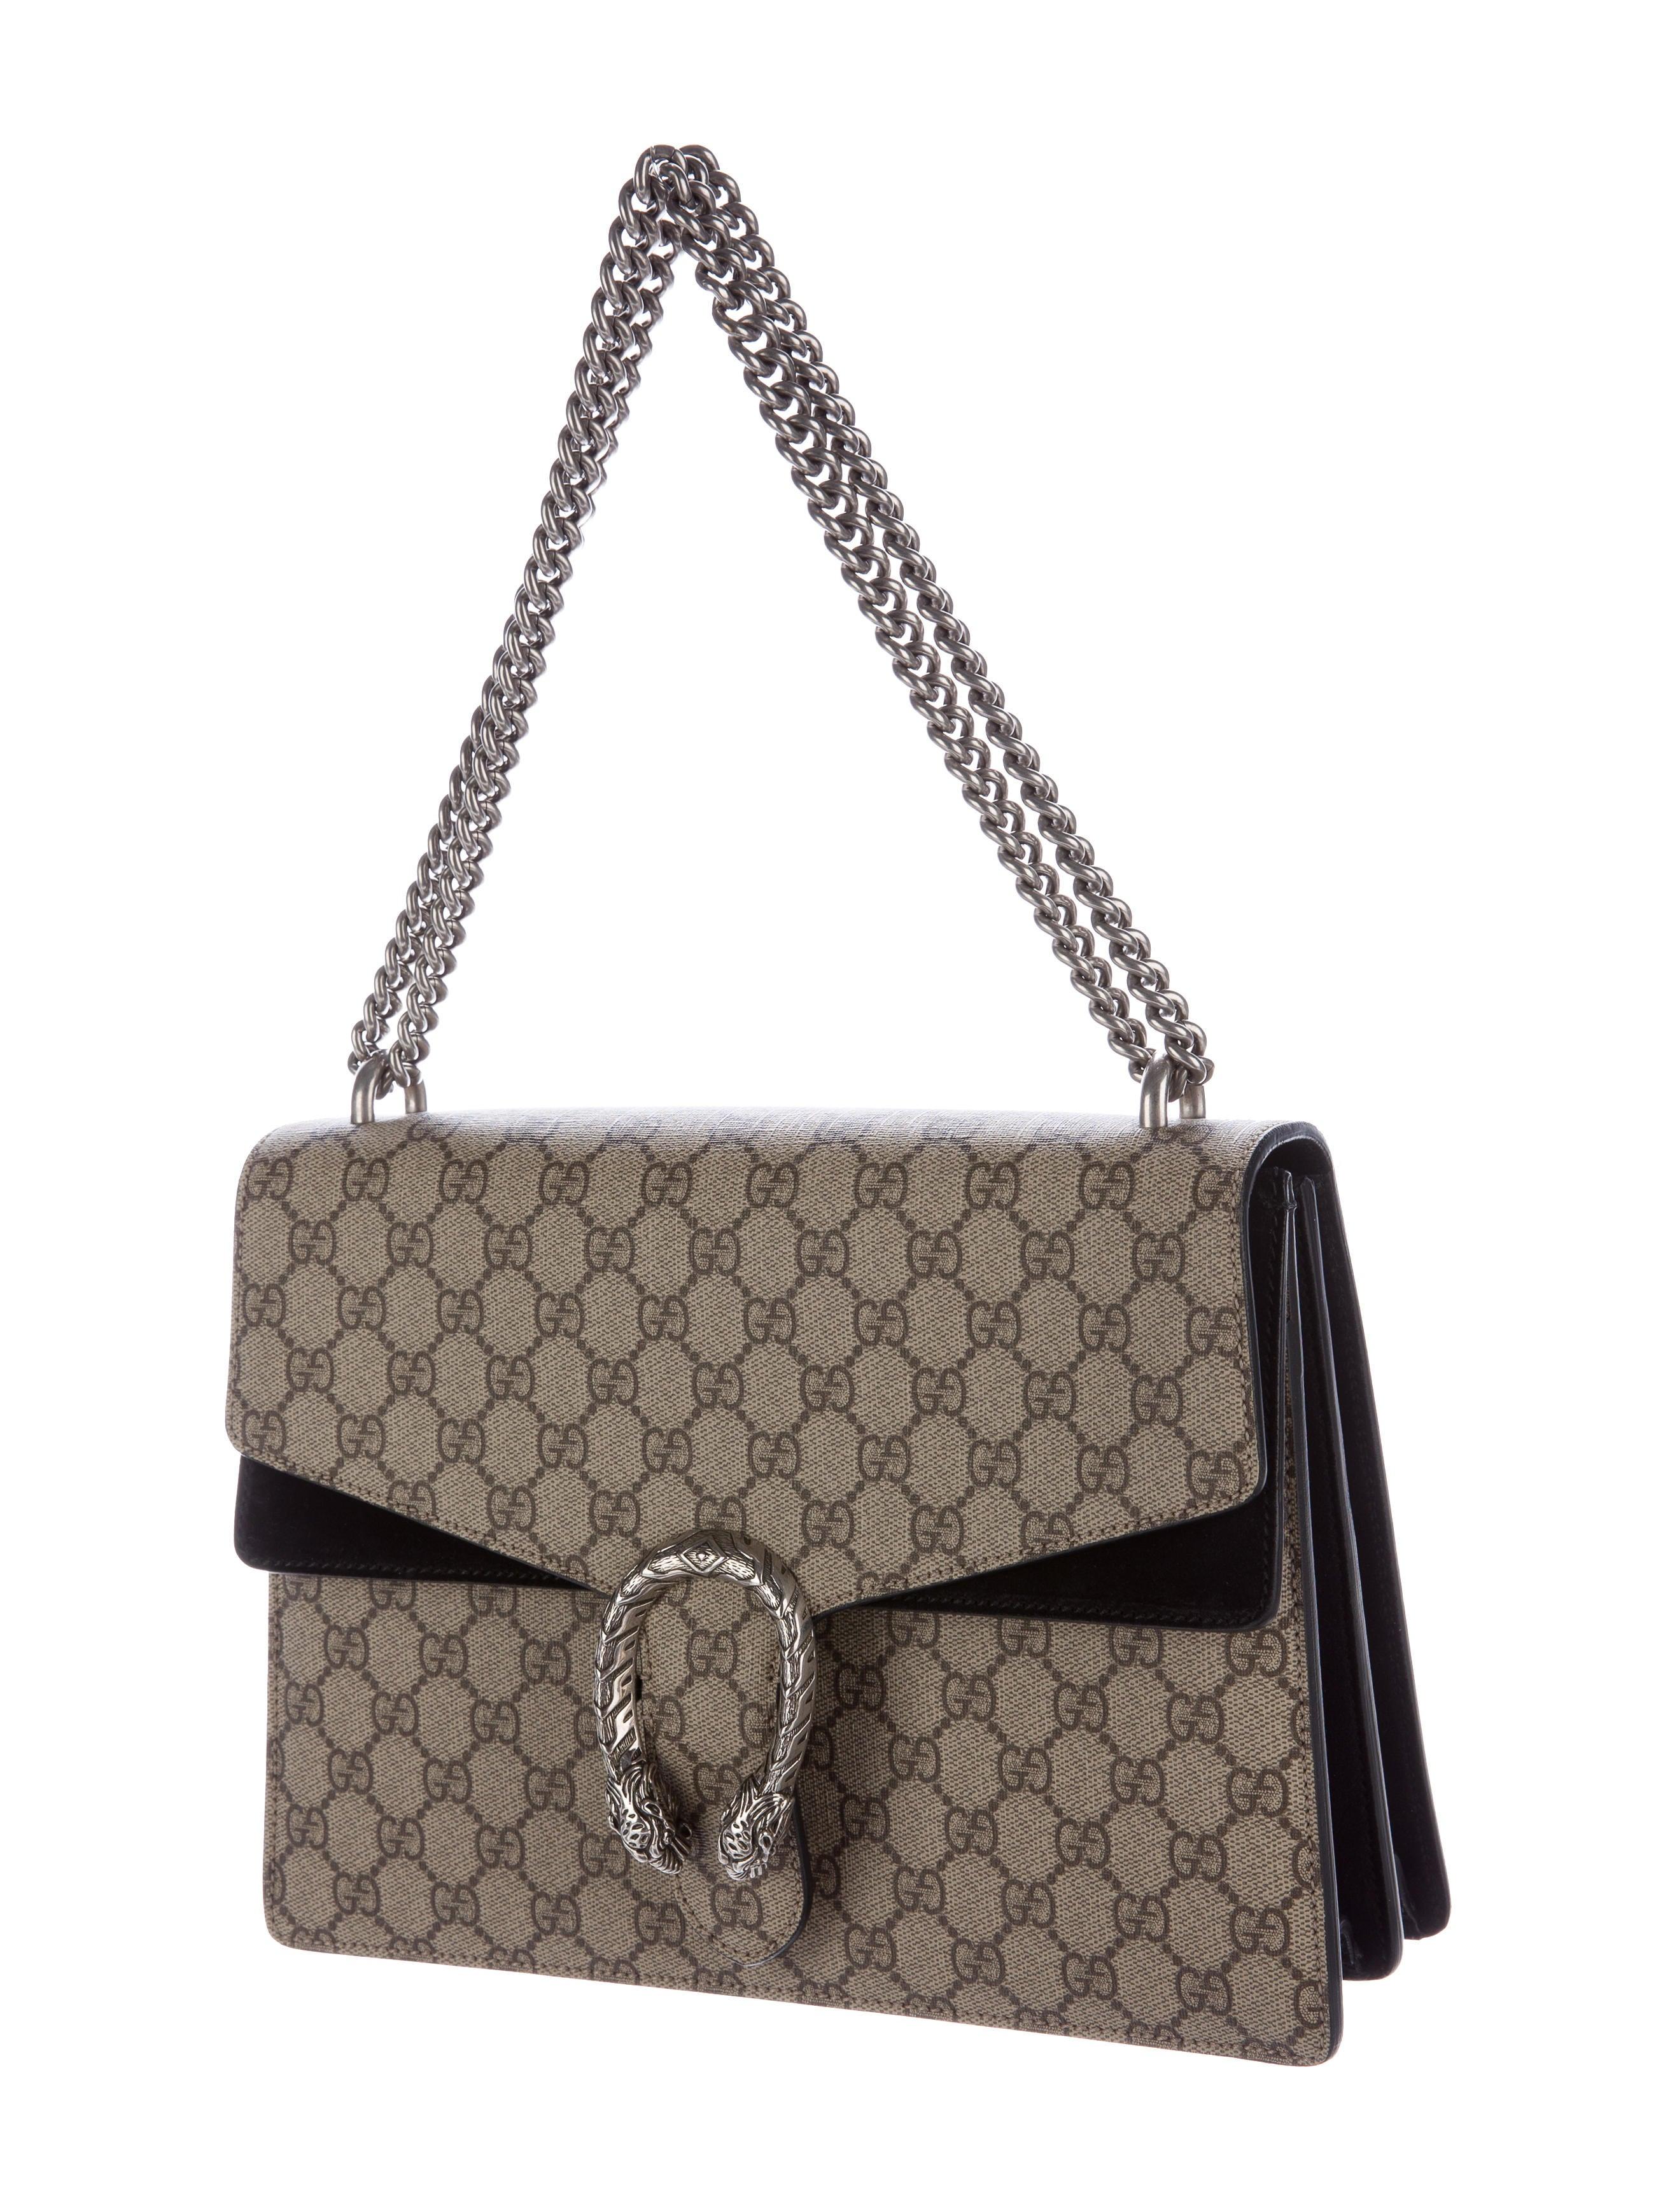 7bce5908dbc8 Gucci Gg Supreme Medium Shoulder Bag 523354 Dark Coffee | Stanford ...